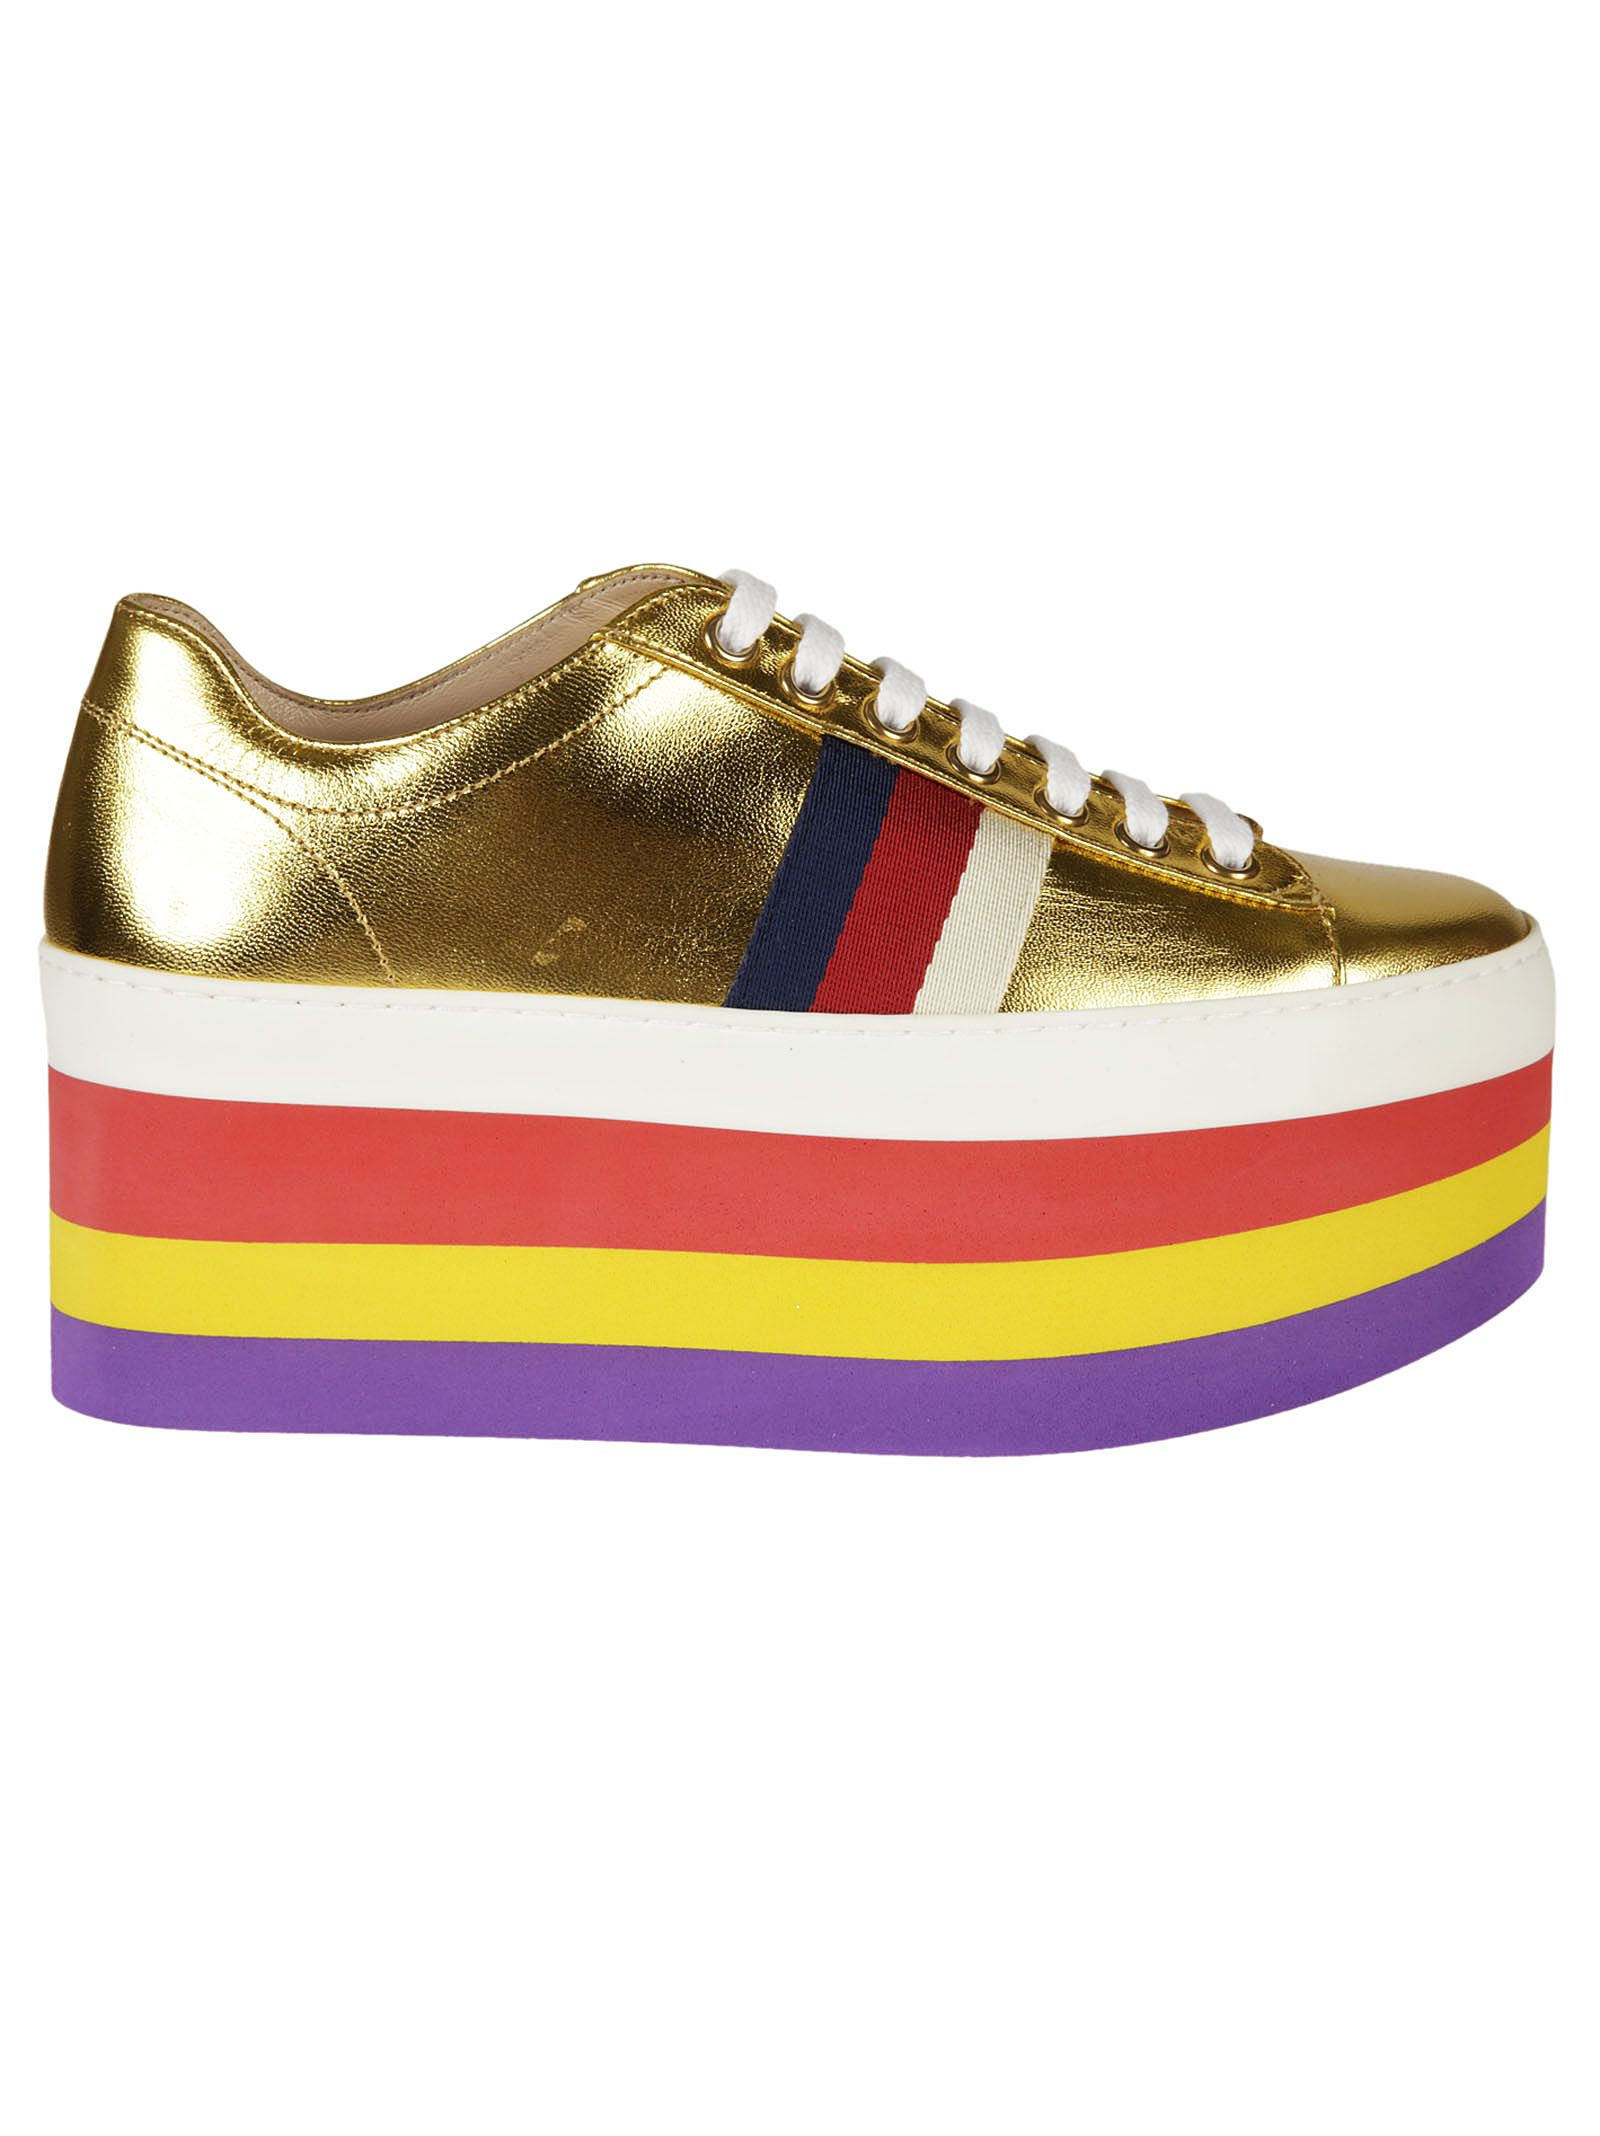 Gucci Gucci Metallic Platform Sneakers